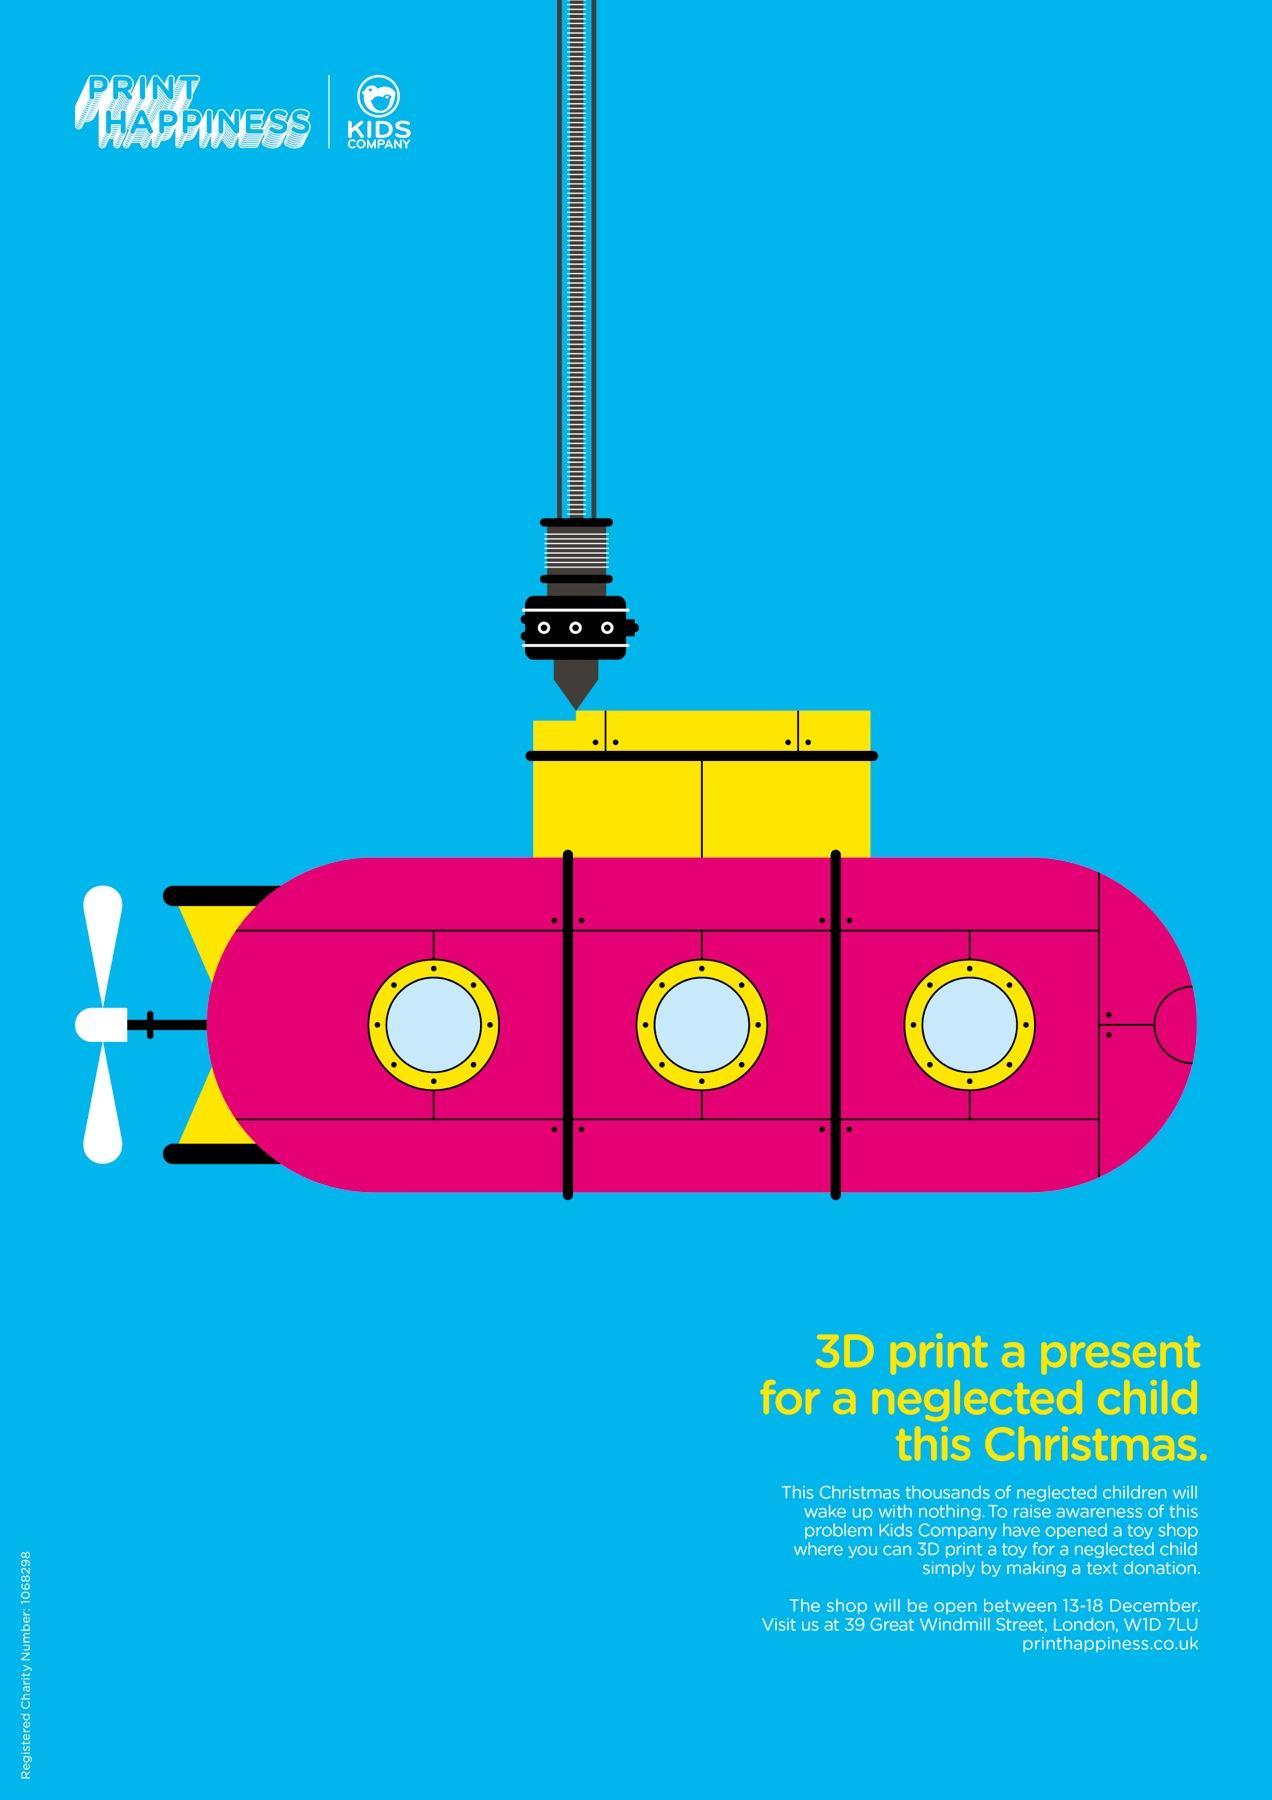 Kids Company Print Ad -  Print Happiness, 4